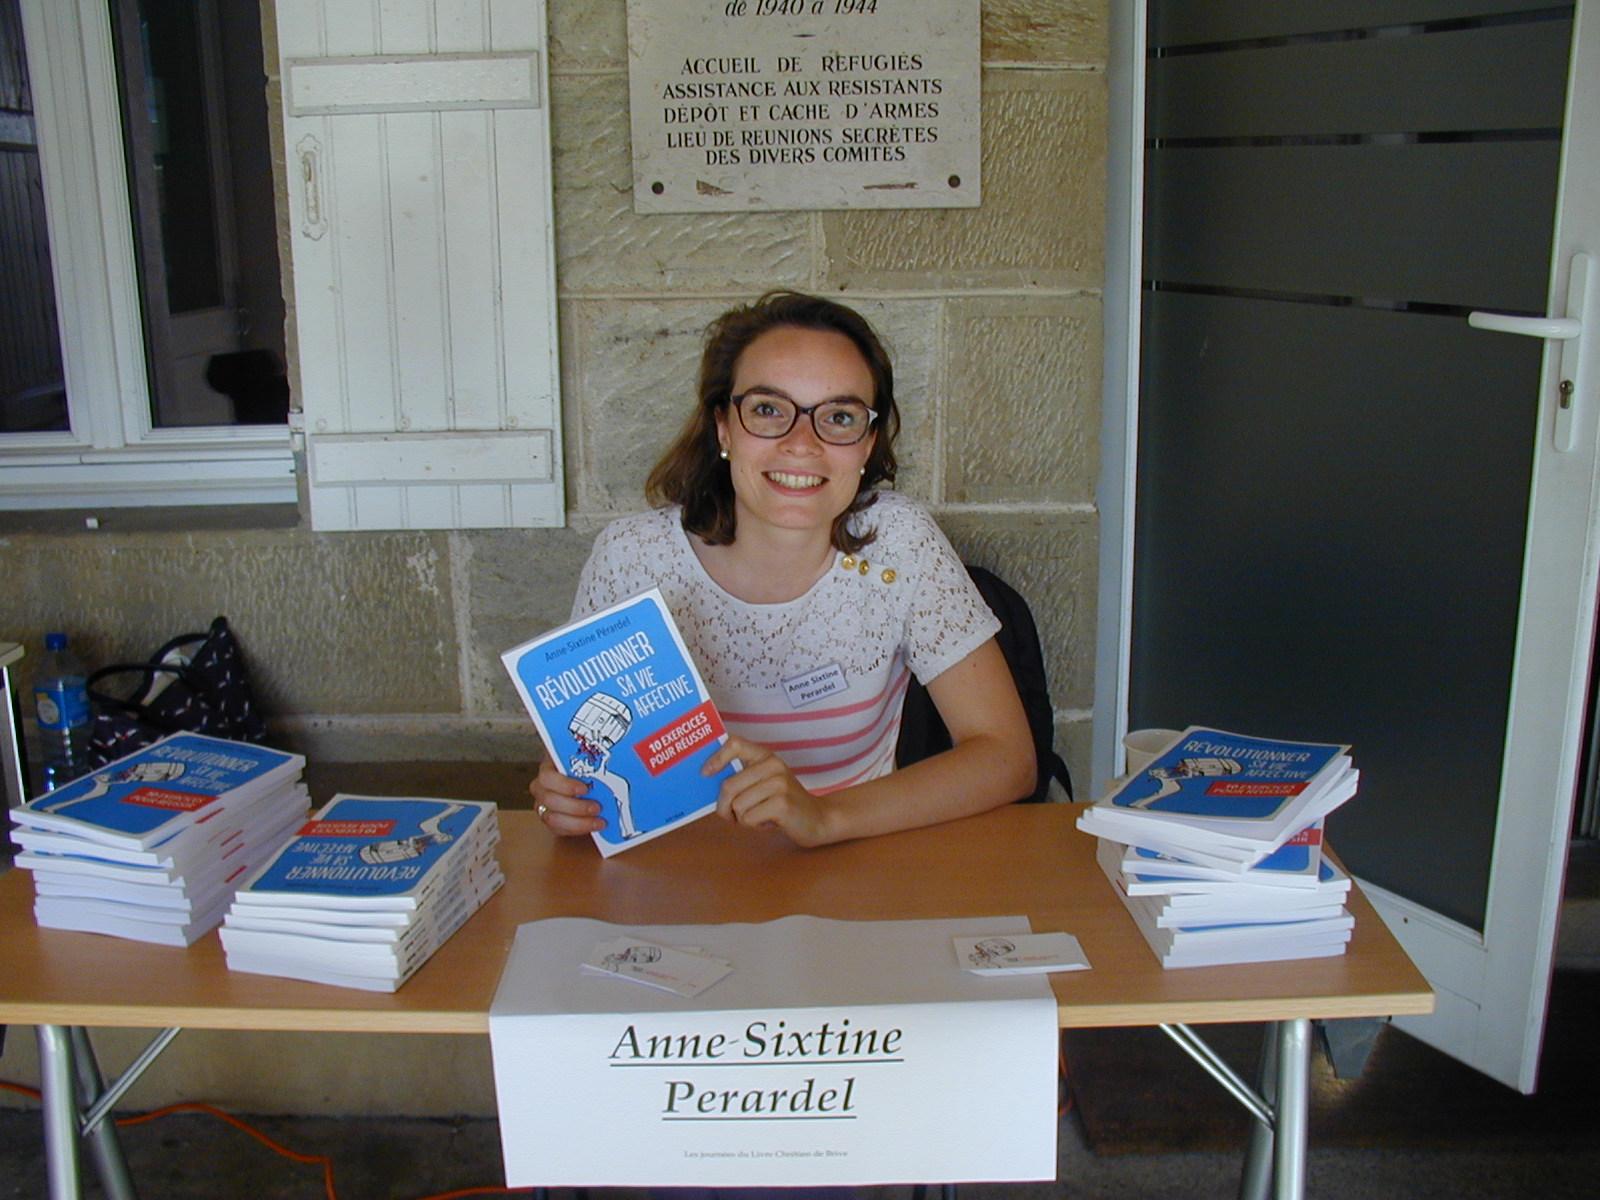 Anne Sixtine Perardel